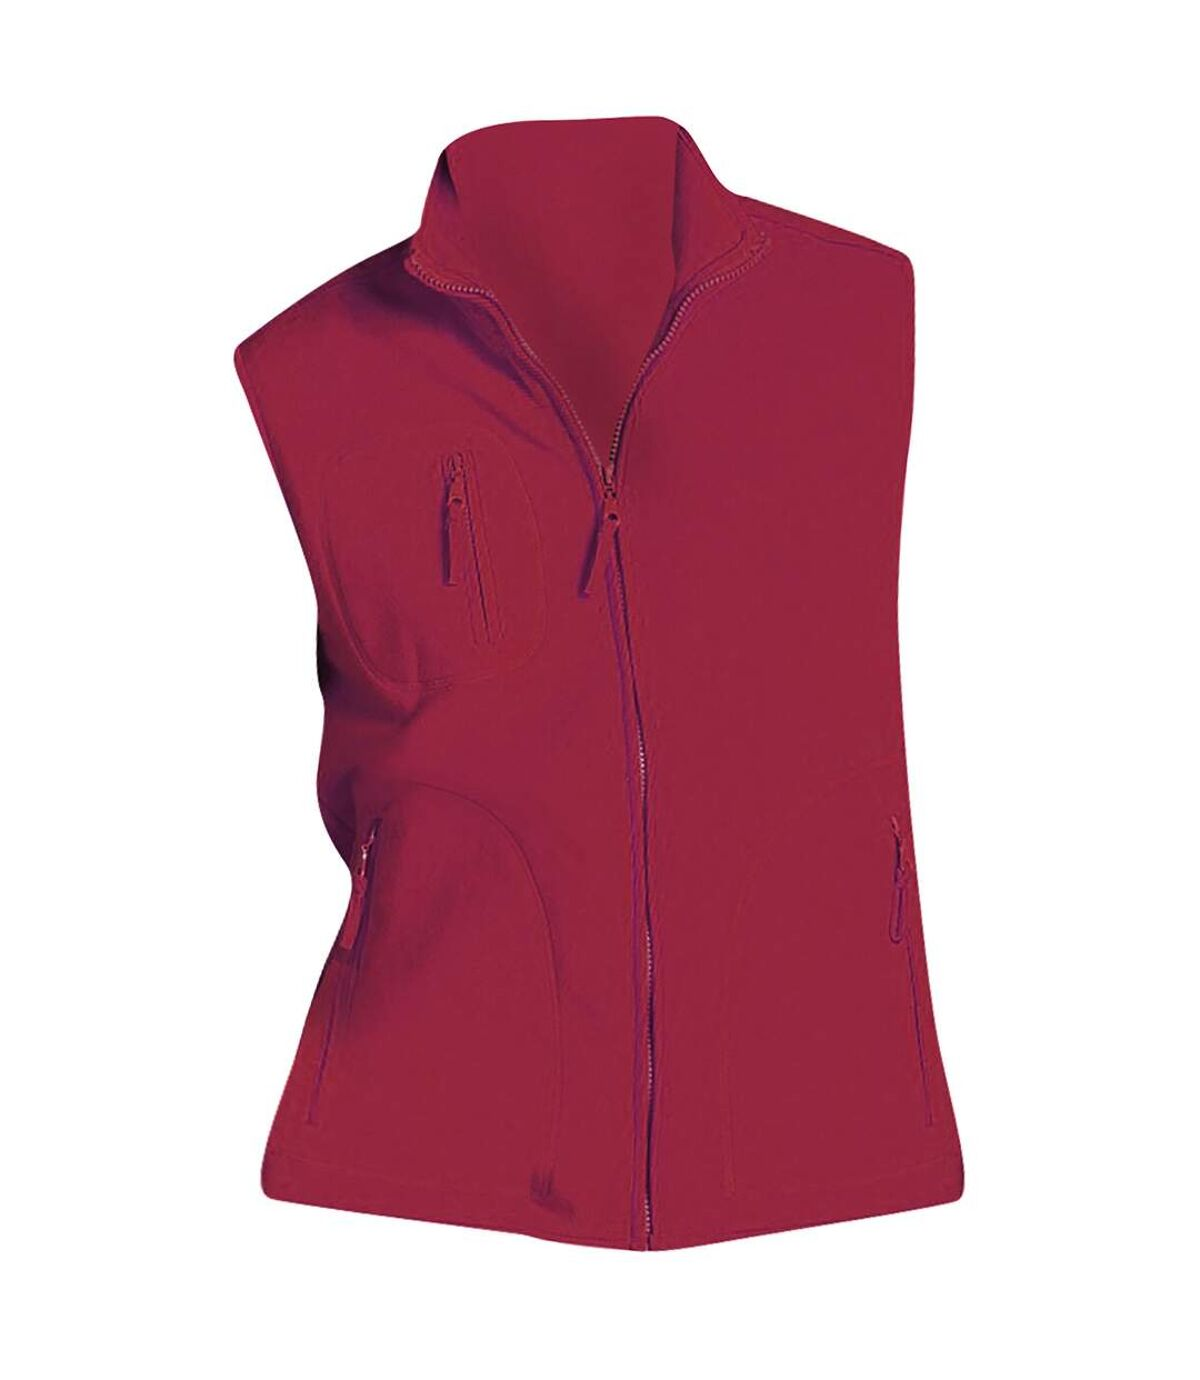 SOLS Norway Unisex Anti-Pill Fleece Bodywarmer / Gilet (Charcoal) - UTPC346